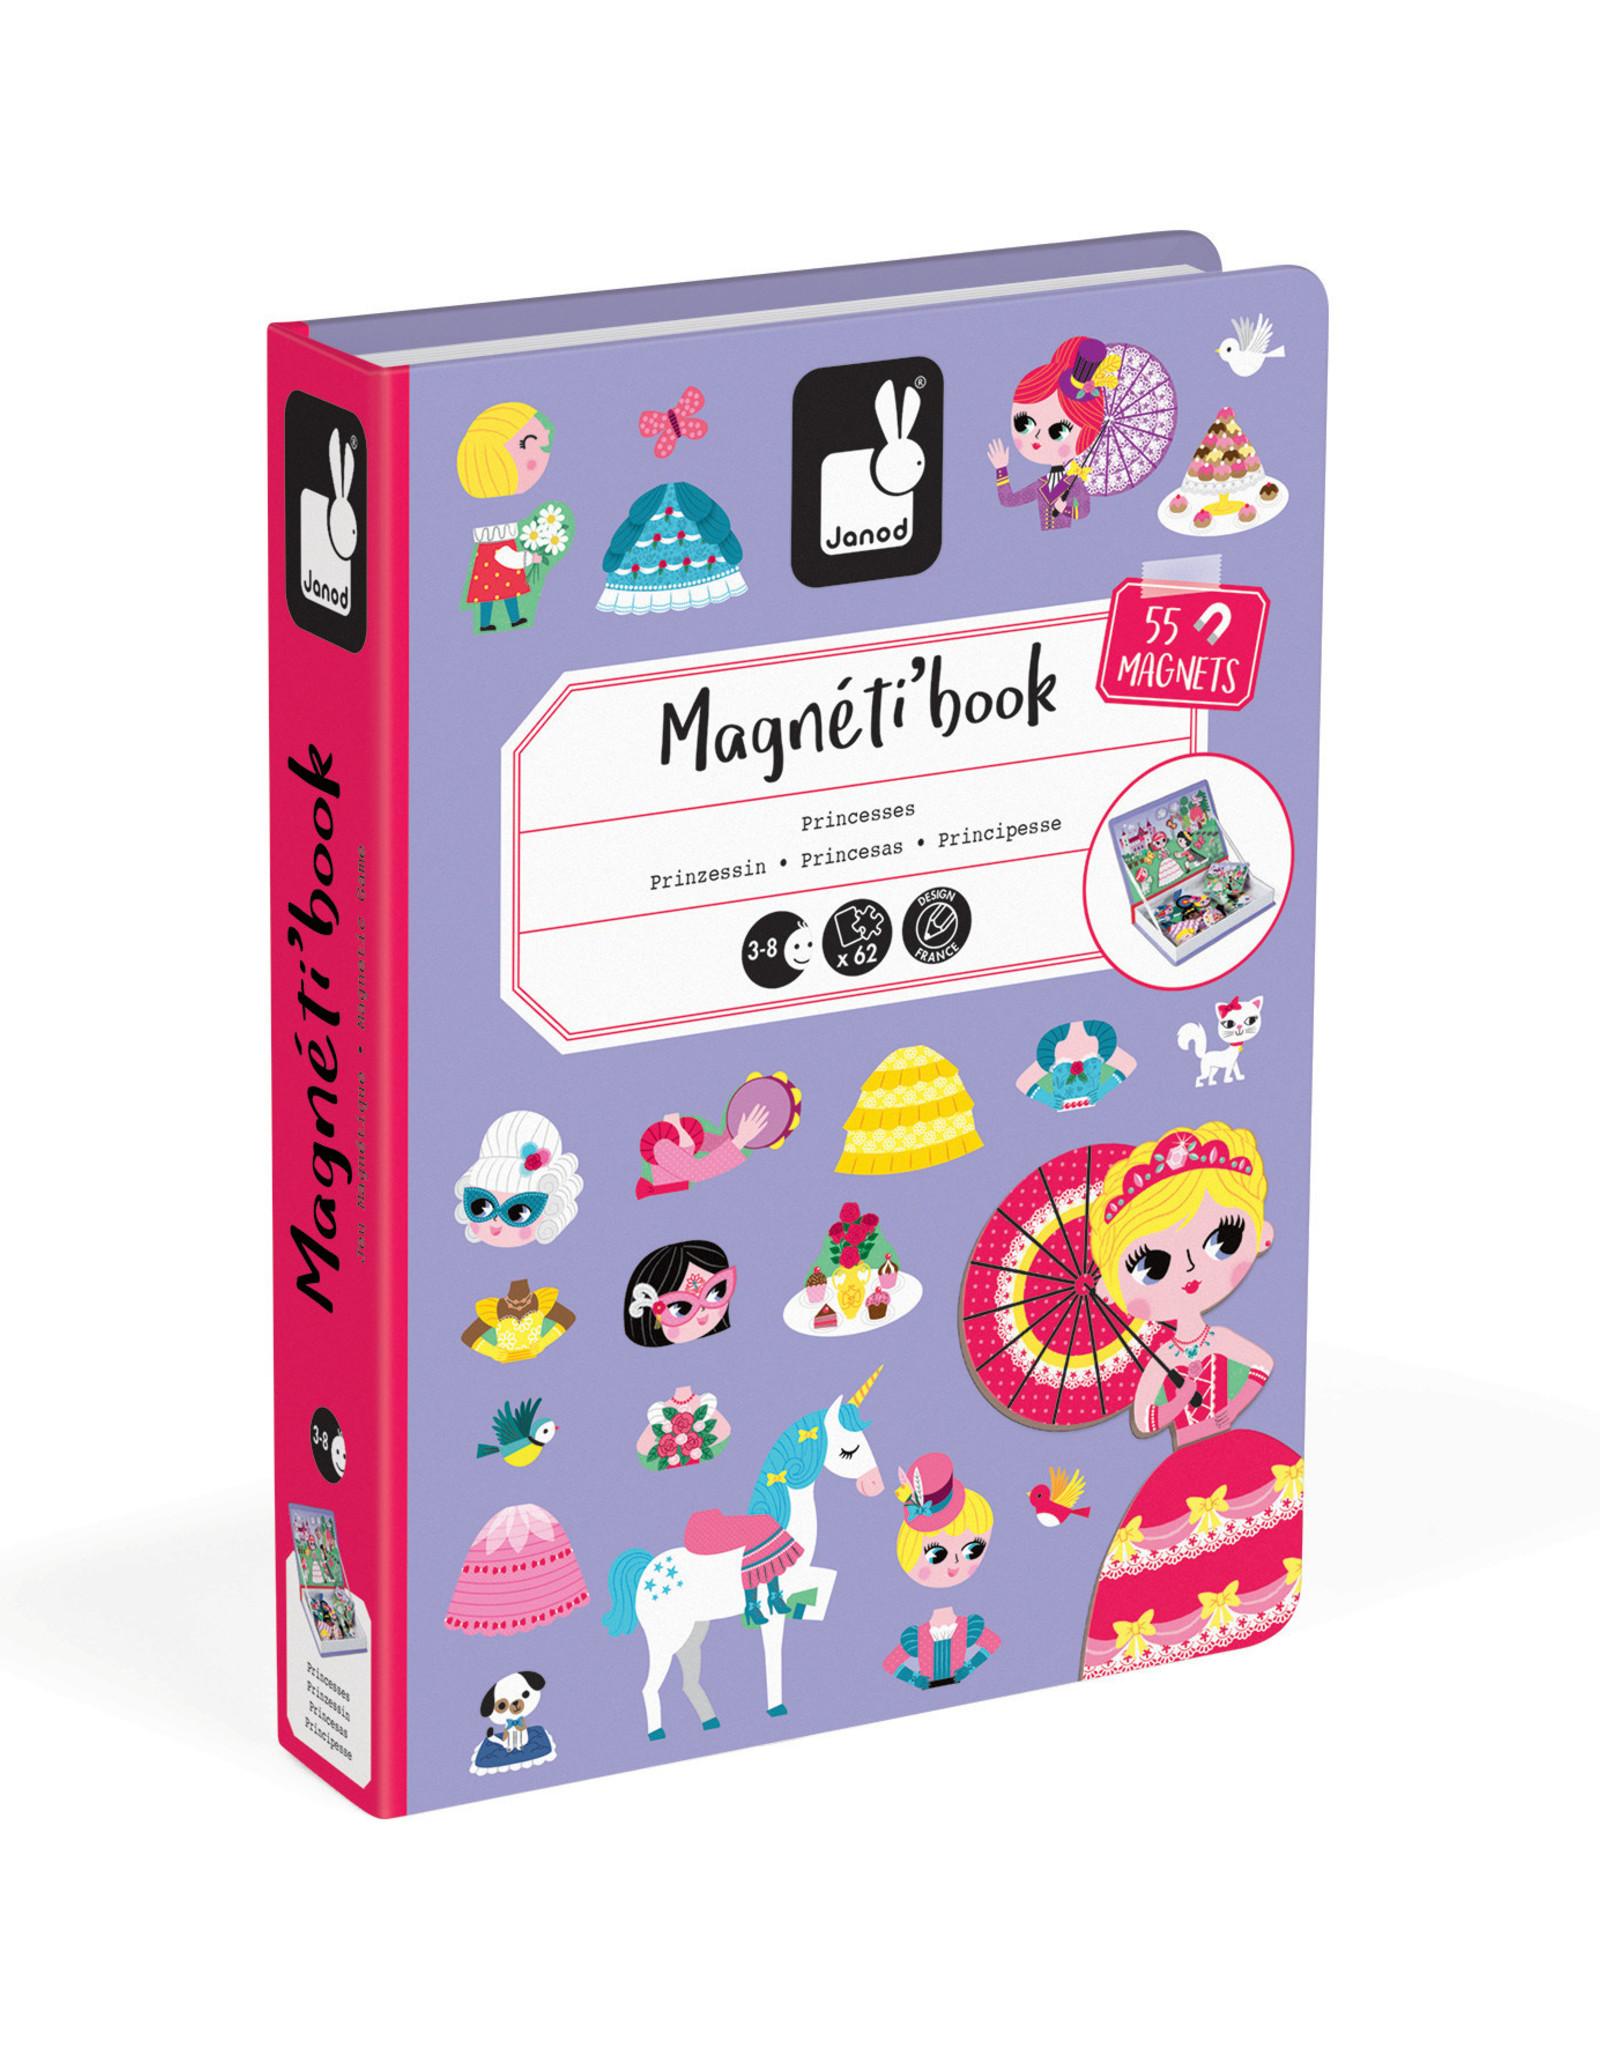 Janod Janod Magneti'book - Princess